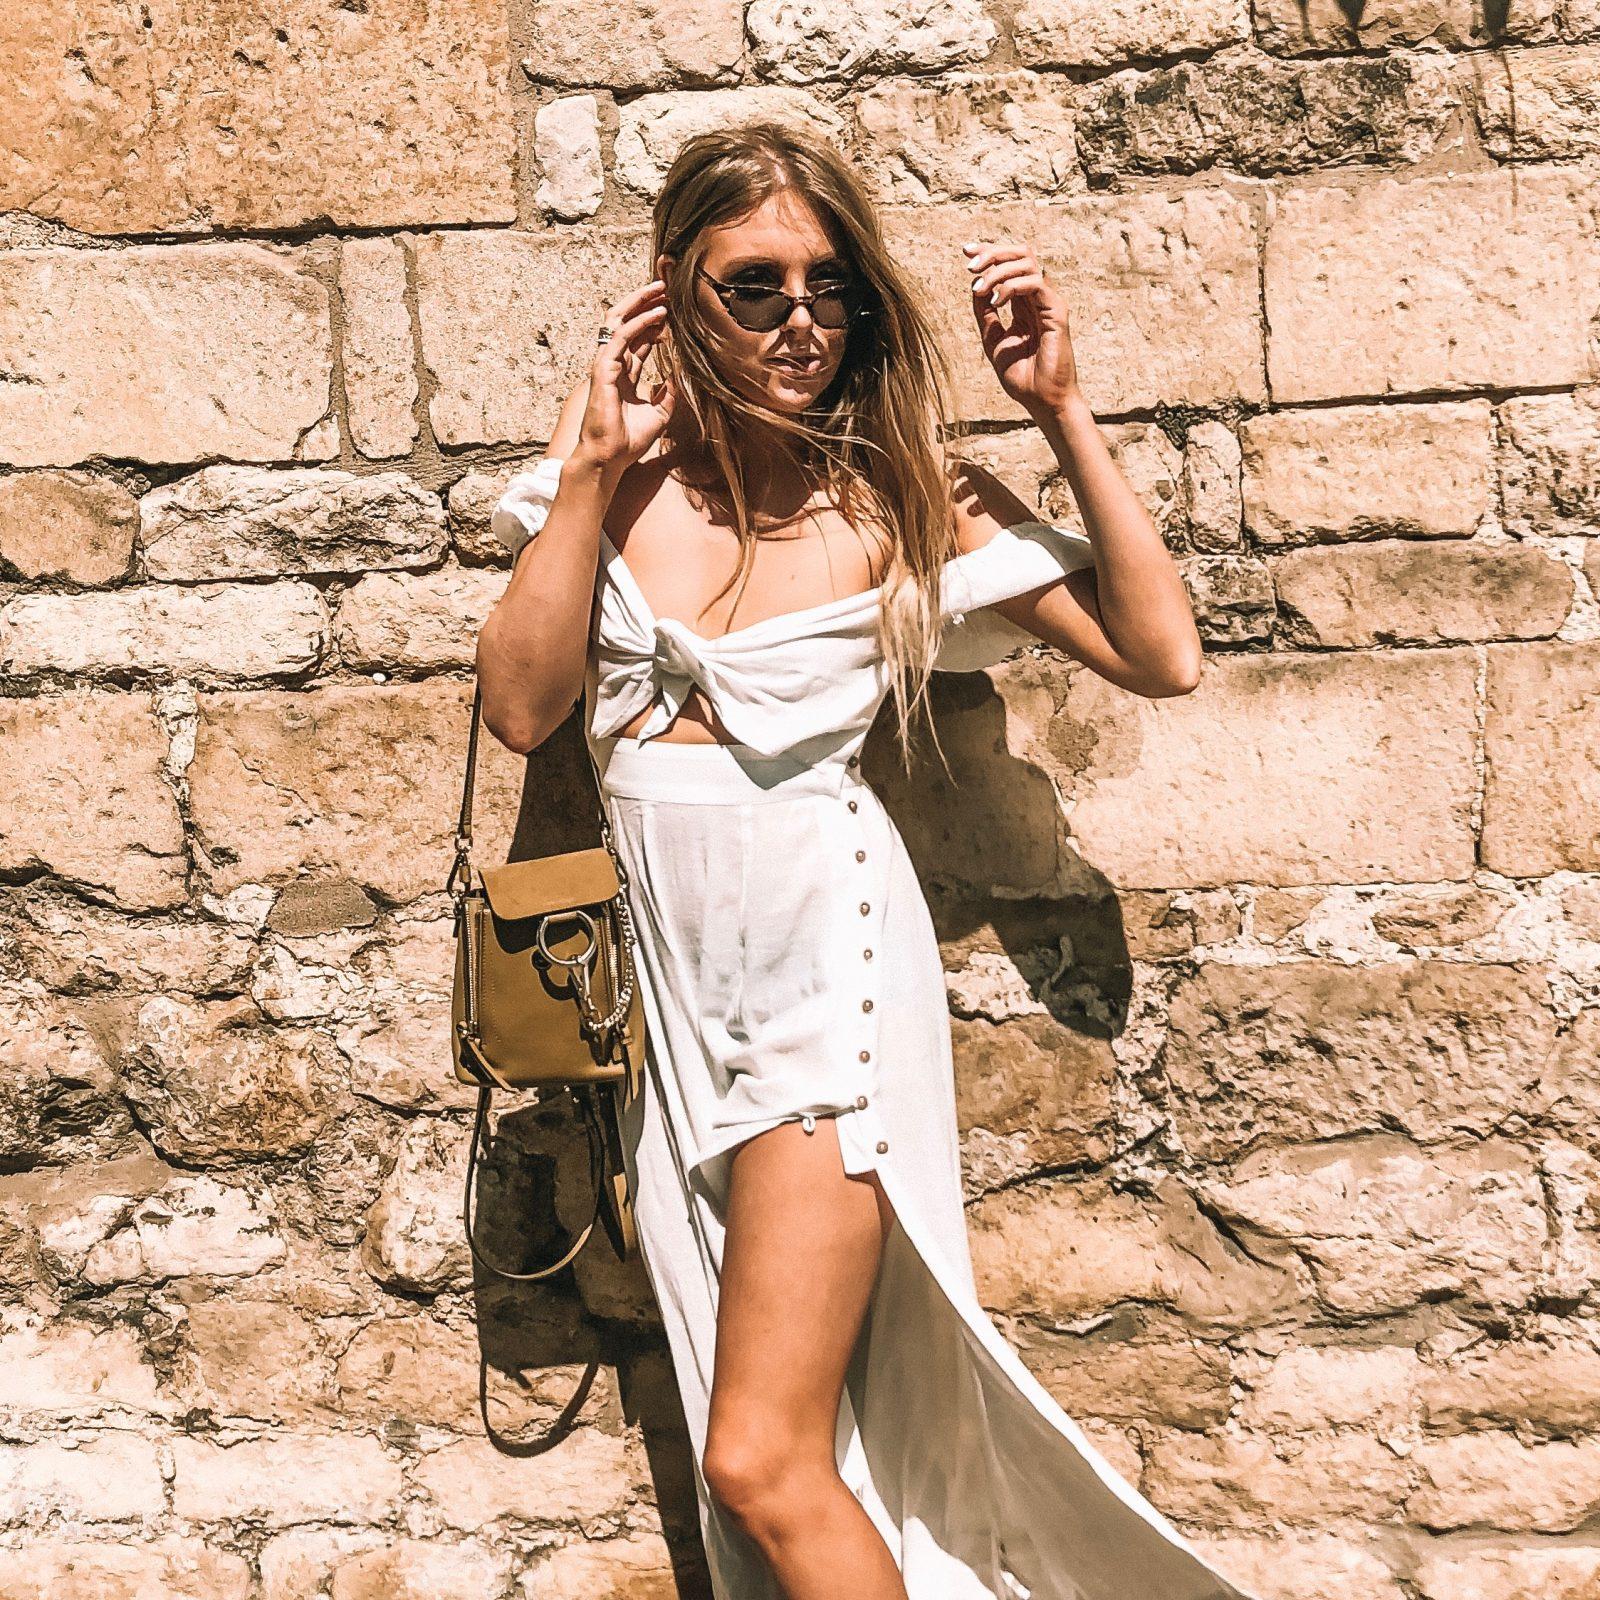 Free People Summer Dress - Tie Front Dress - Fashion Blogger Sinead Crowe